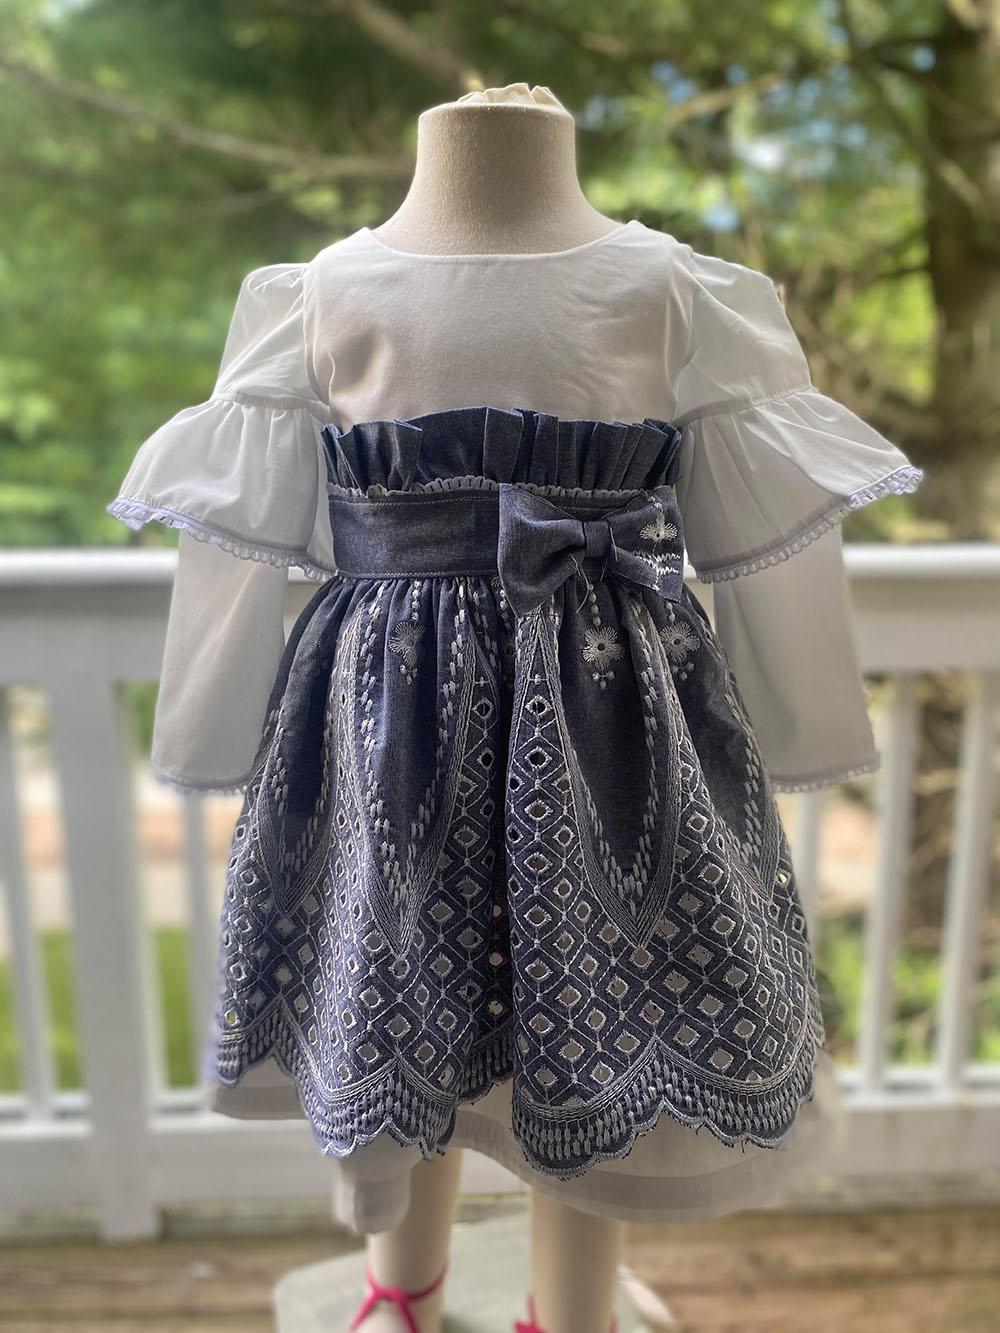 Esperanza's Ruffle Easter Dress Sizes 2T to 14 Kids PDF Pattern